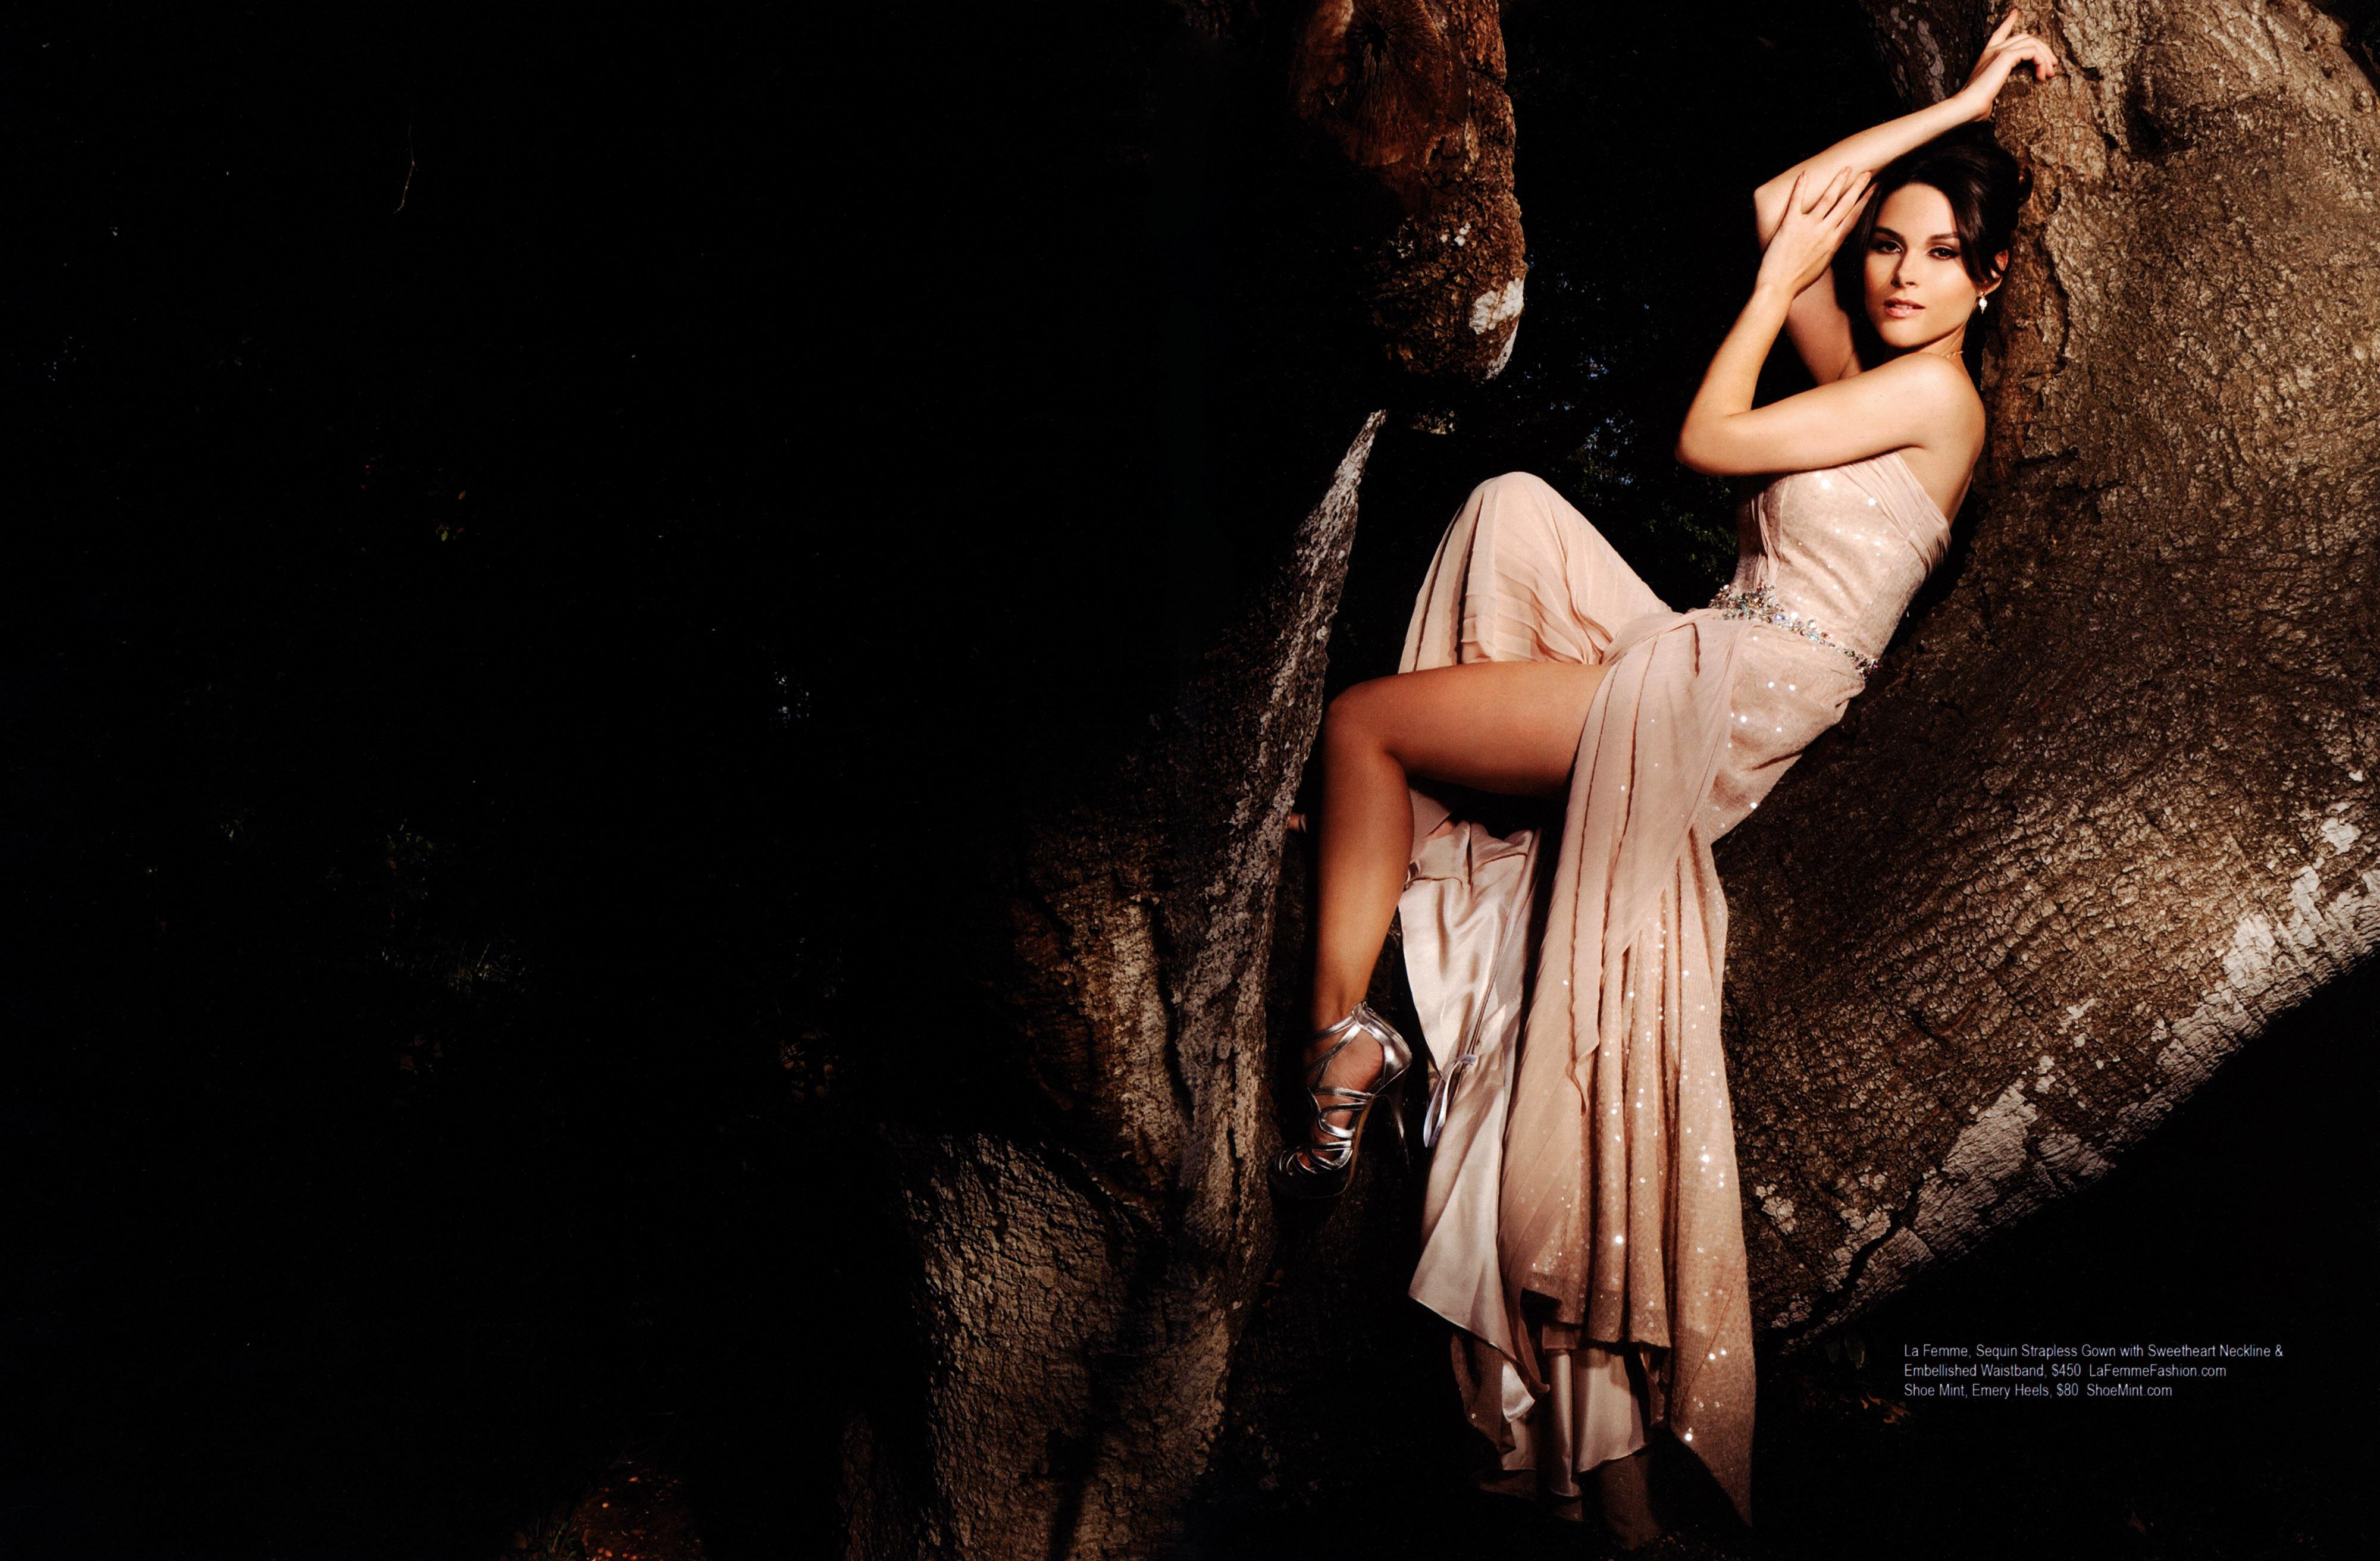 http://pics.wikifeet.com/Fernanda-Machado-Feet-1584909.jpg